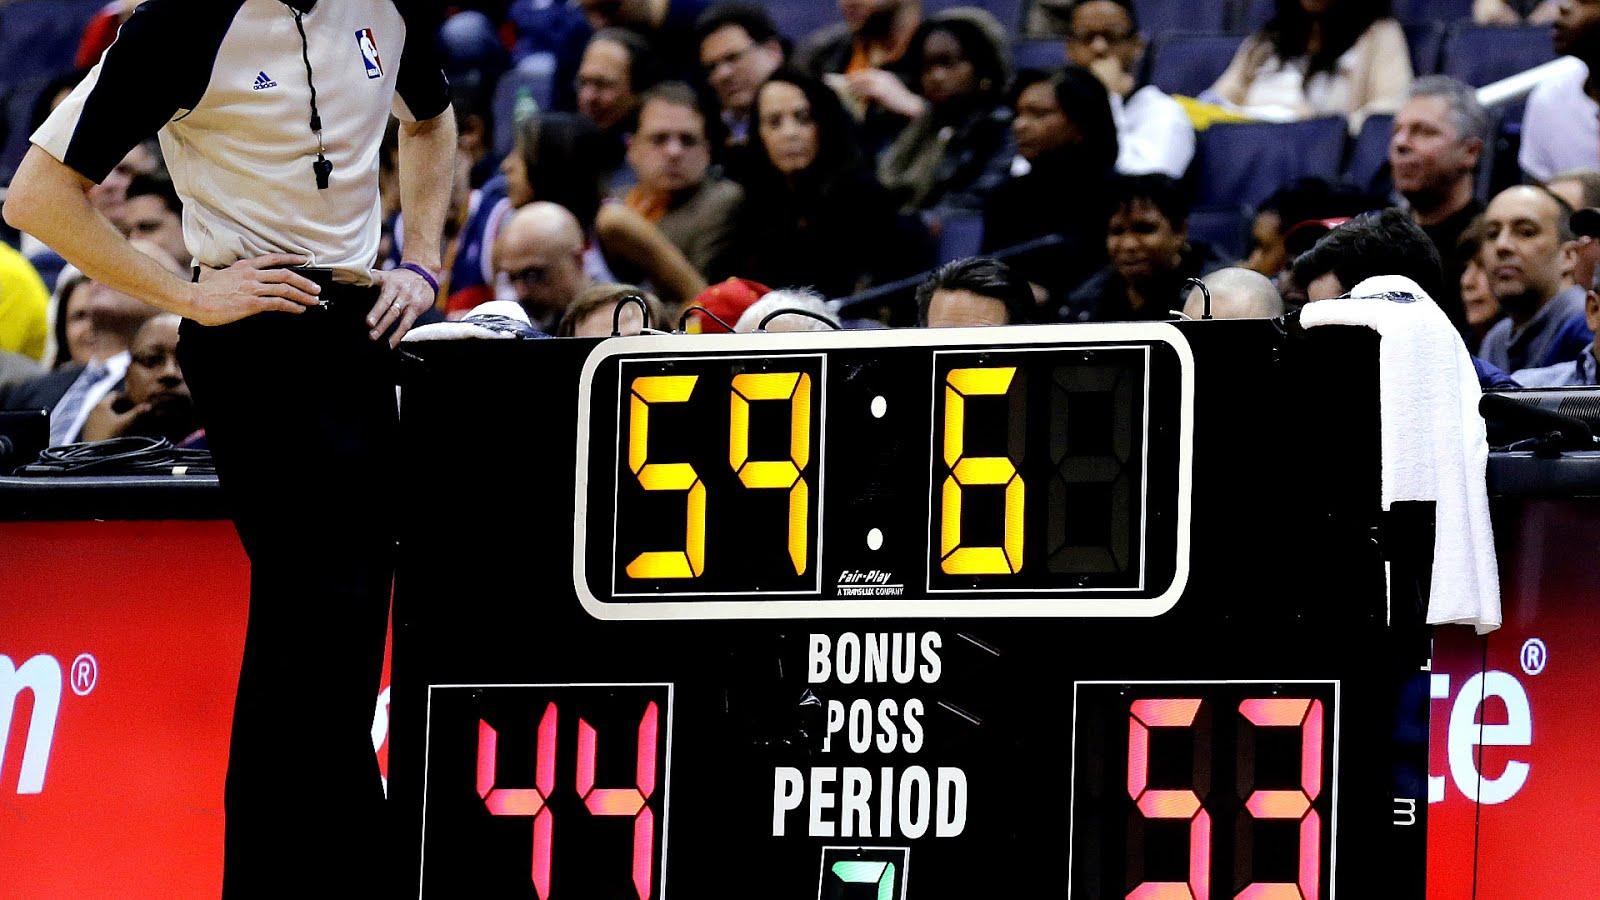 Nba Basketball Scores For Tonight - Basketball Choices